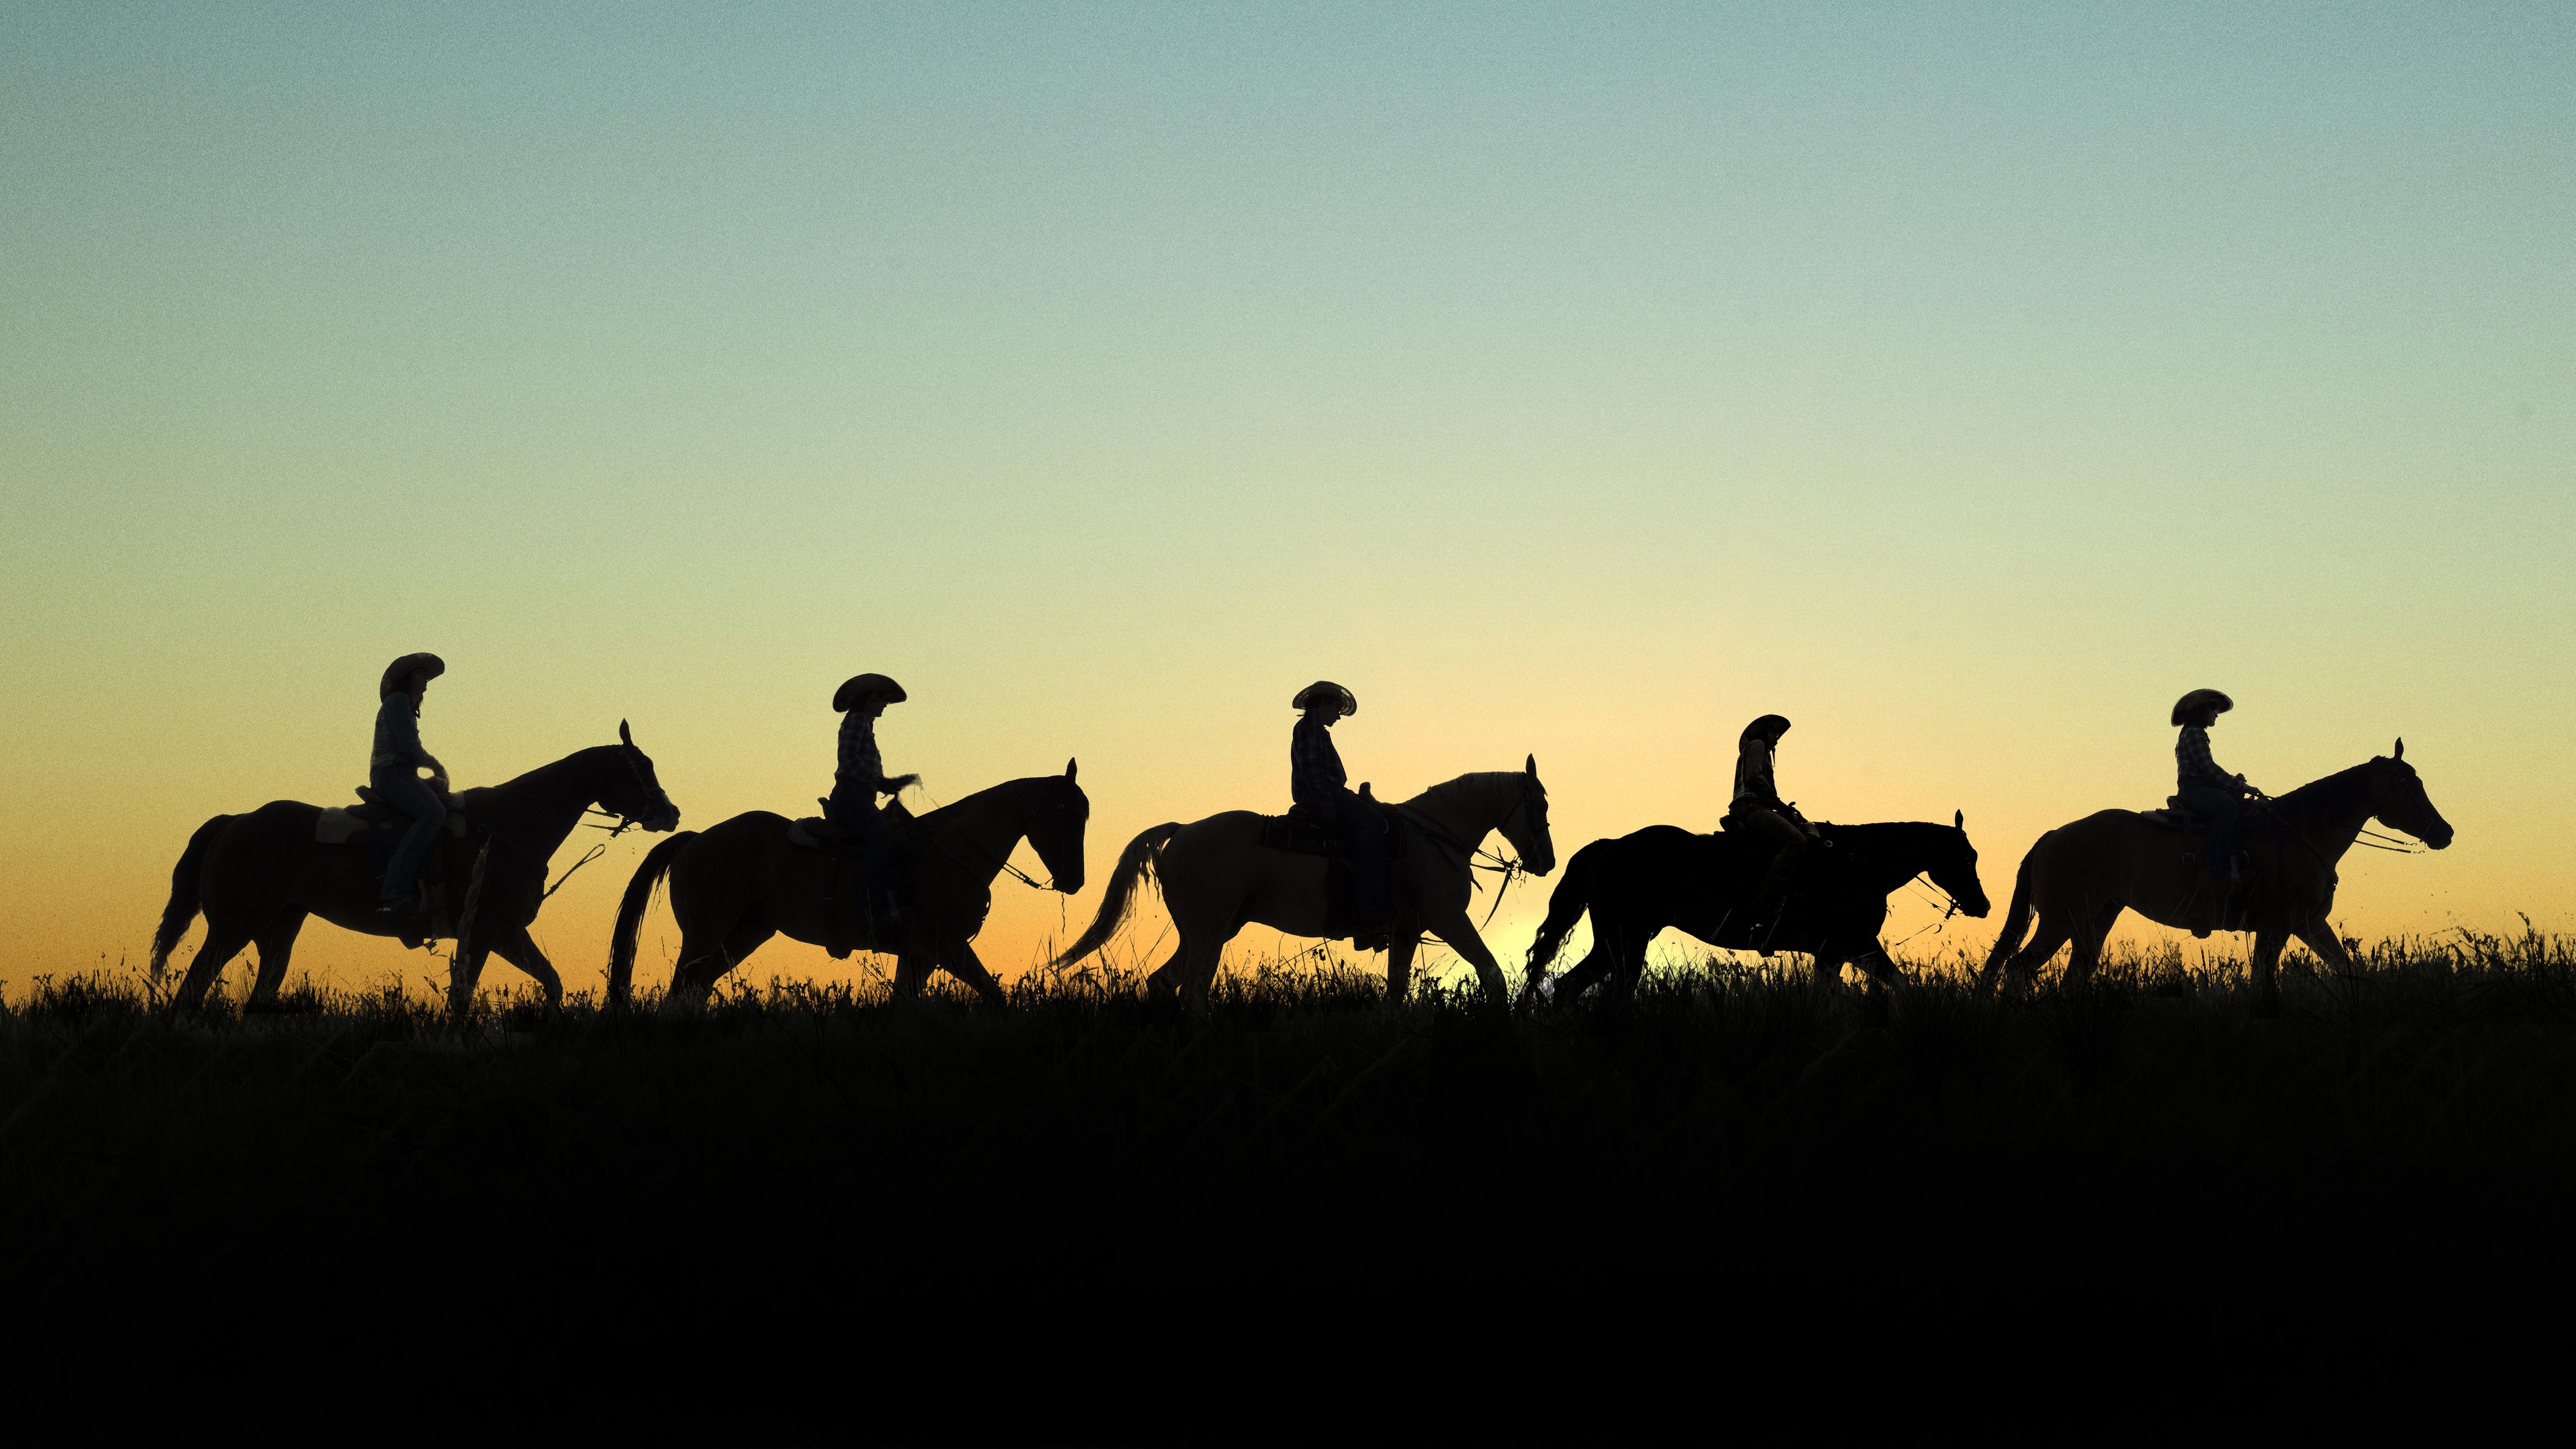 Cowboy team